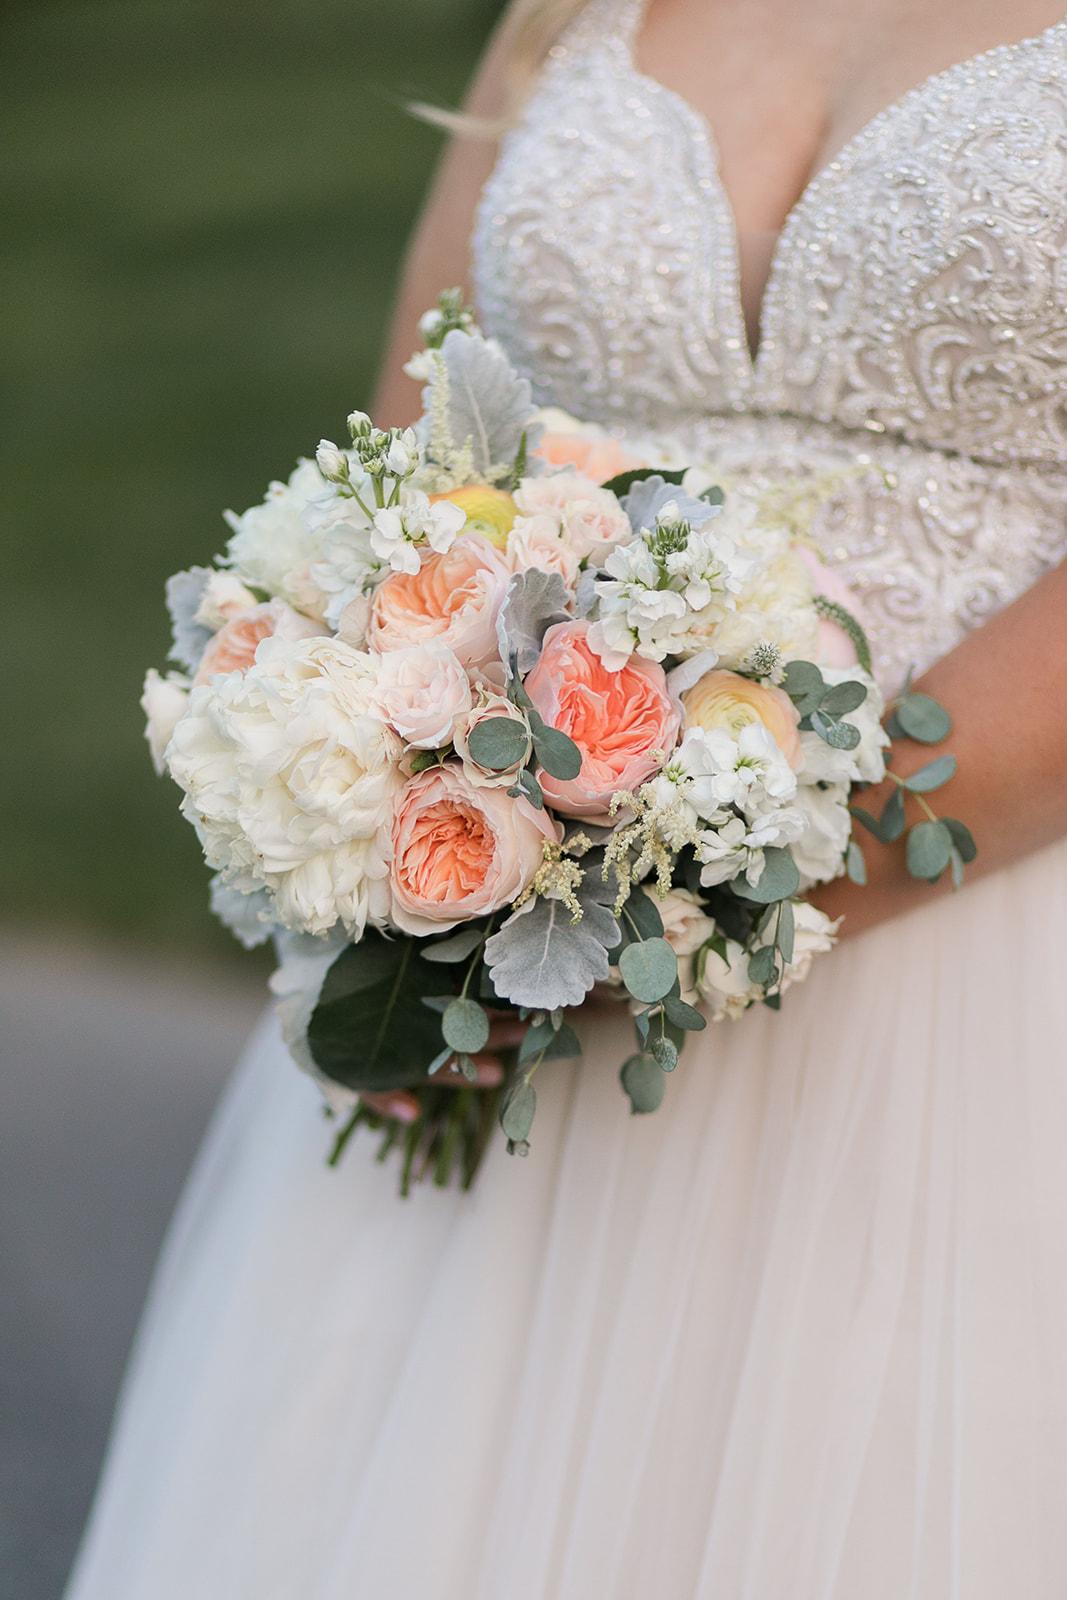 Abbey-Colby-wedding-93_websize.jpg